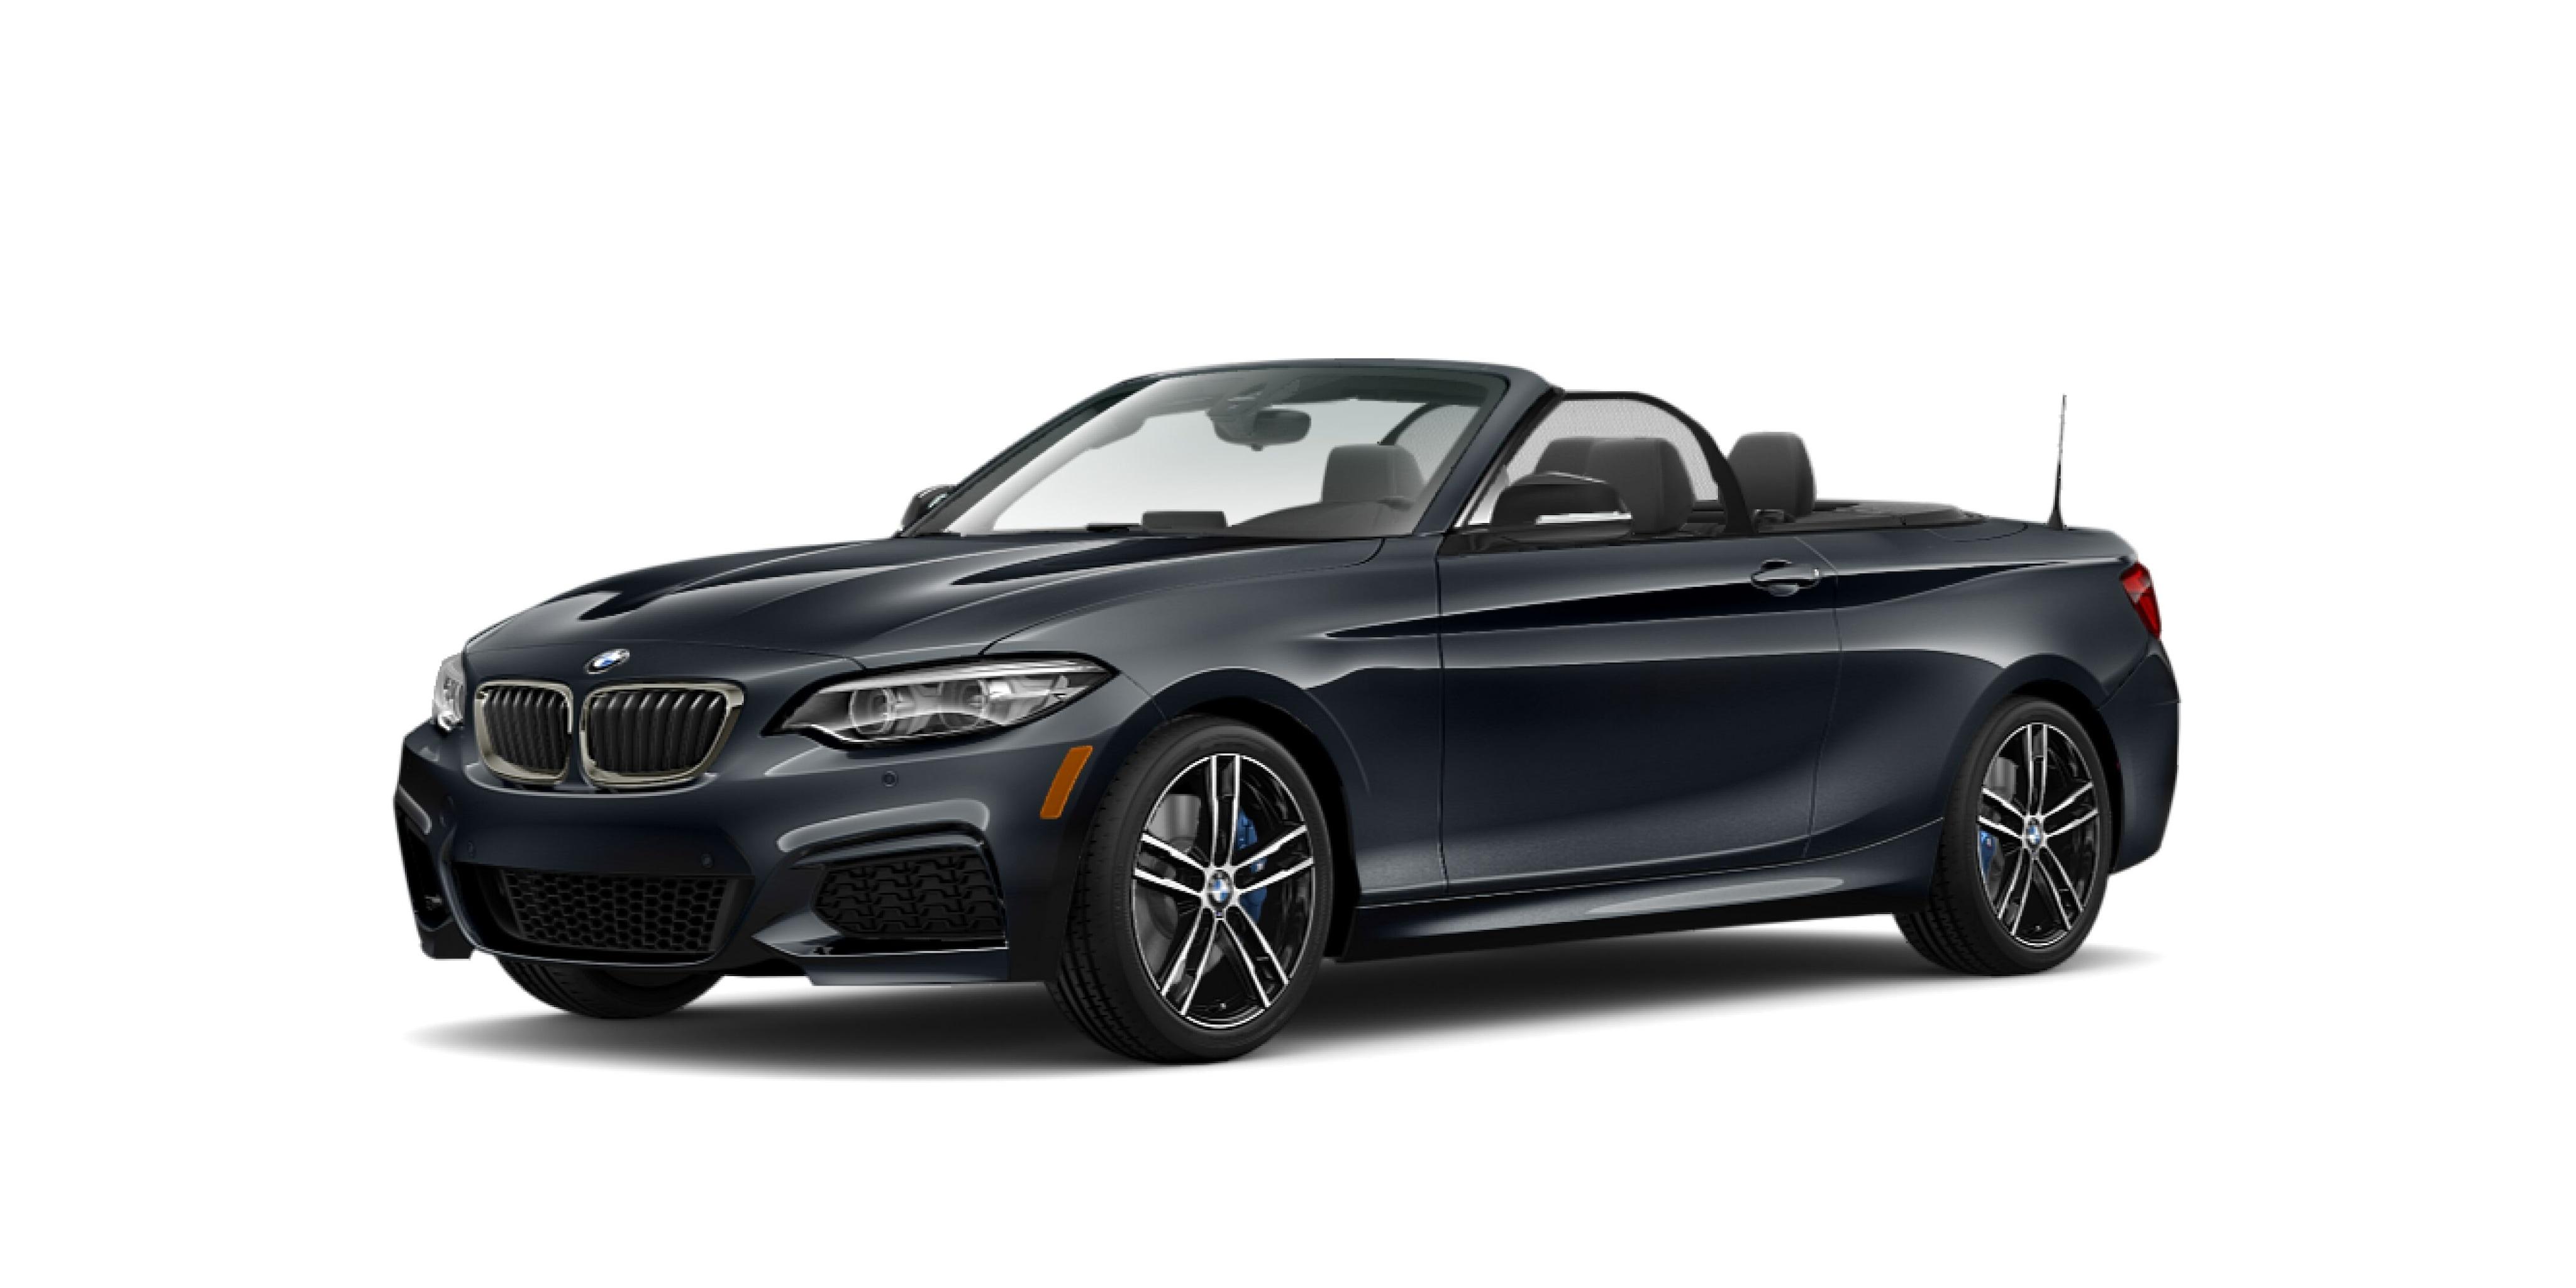 2020 BMW M240i xDrive Convertible Plattsburgh, NY